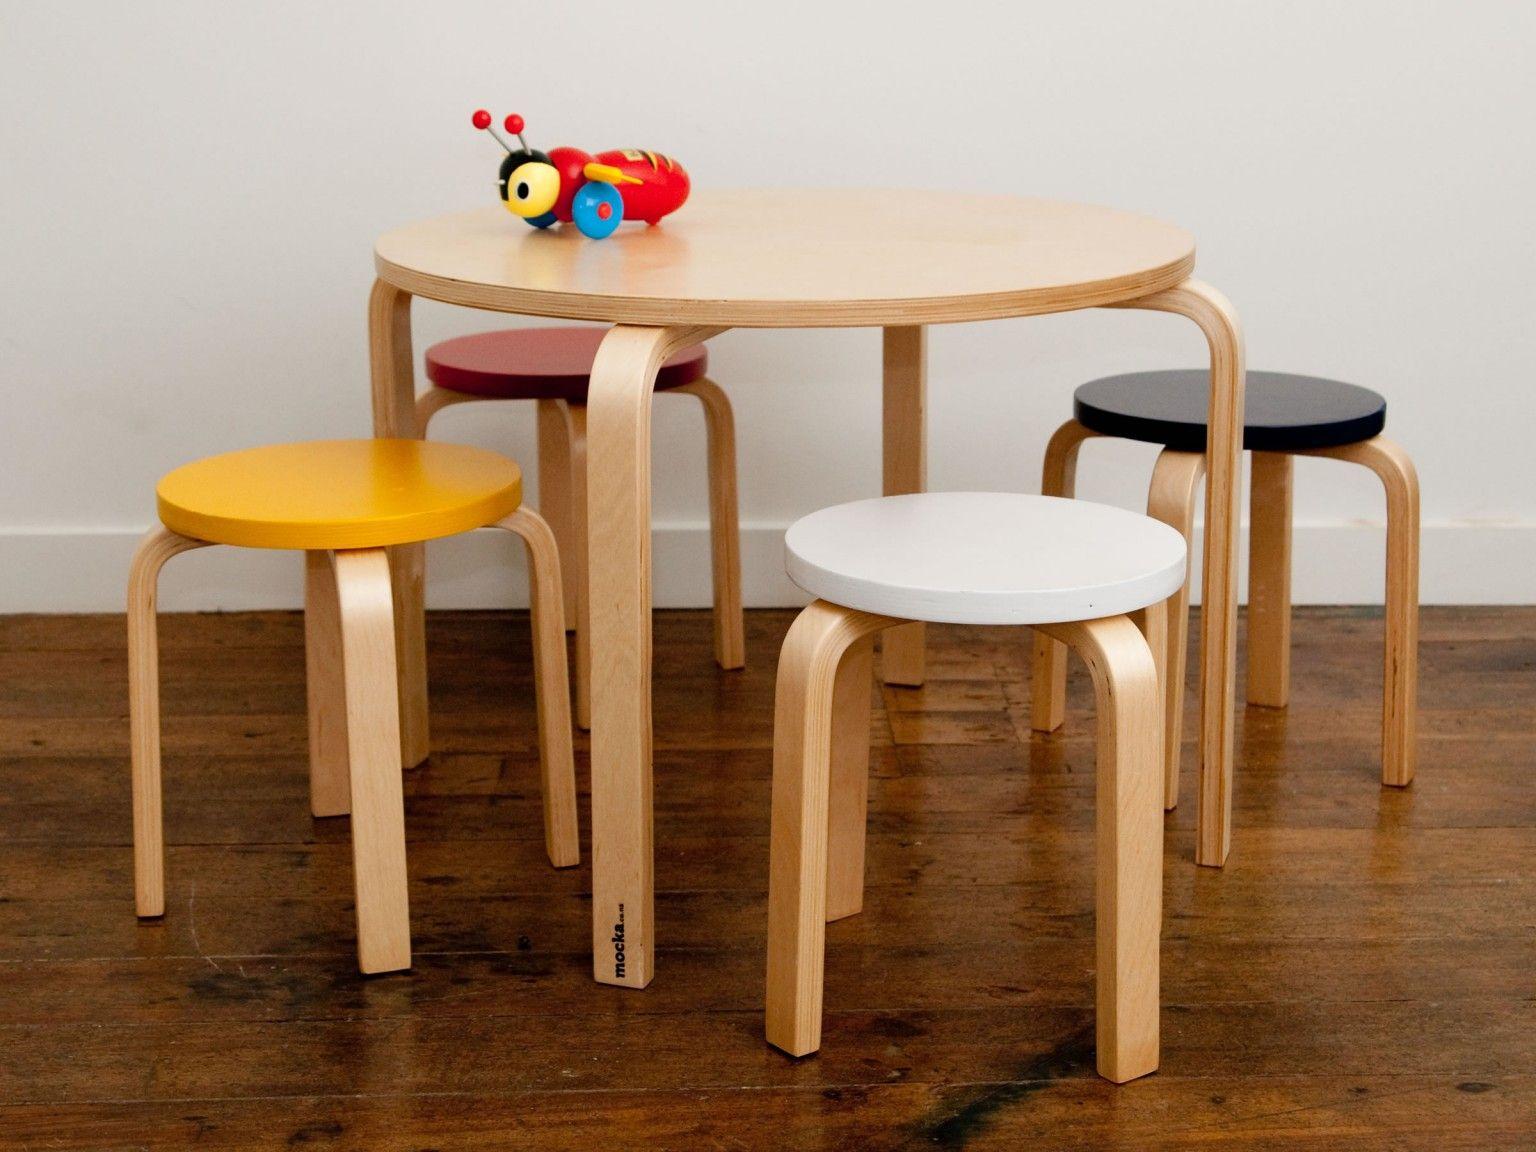 Brilliant Mocka Hudson Kids Table And Stools Coloured Toddler Room Camellatalisay Diy Chair Ideas Camellatalisaycom